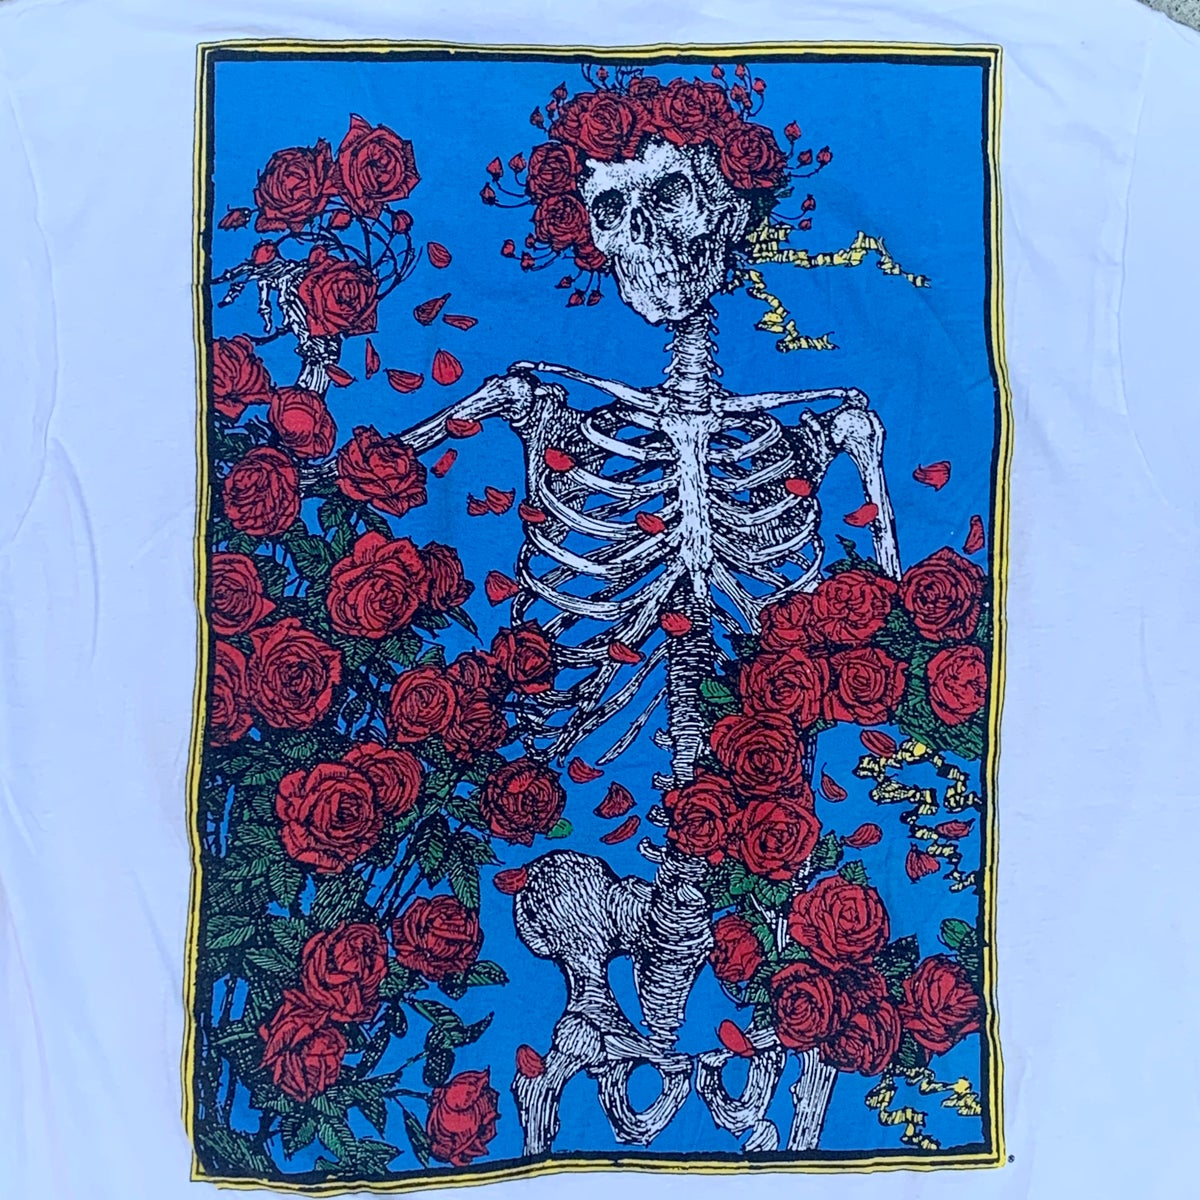 ORIGINAL VINTAGE GRATEFUL DEAD BERTHA 1990 !! XXXL